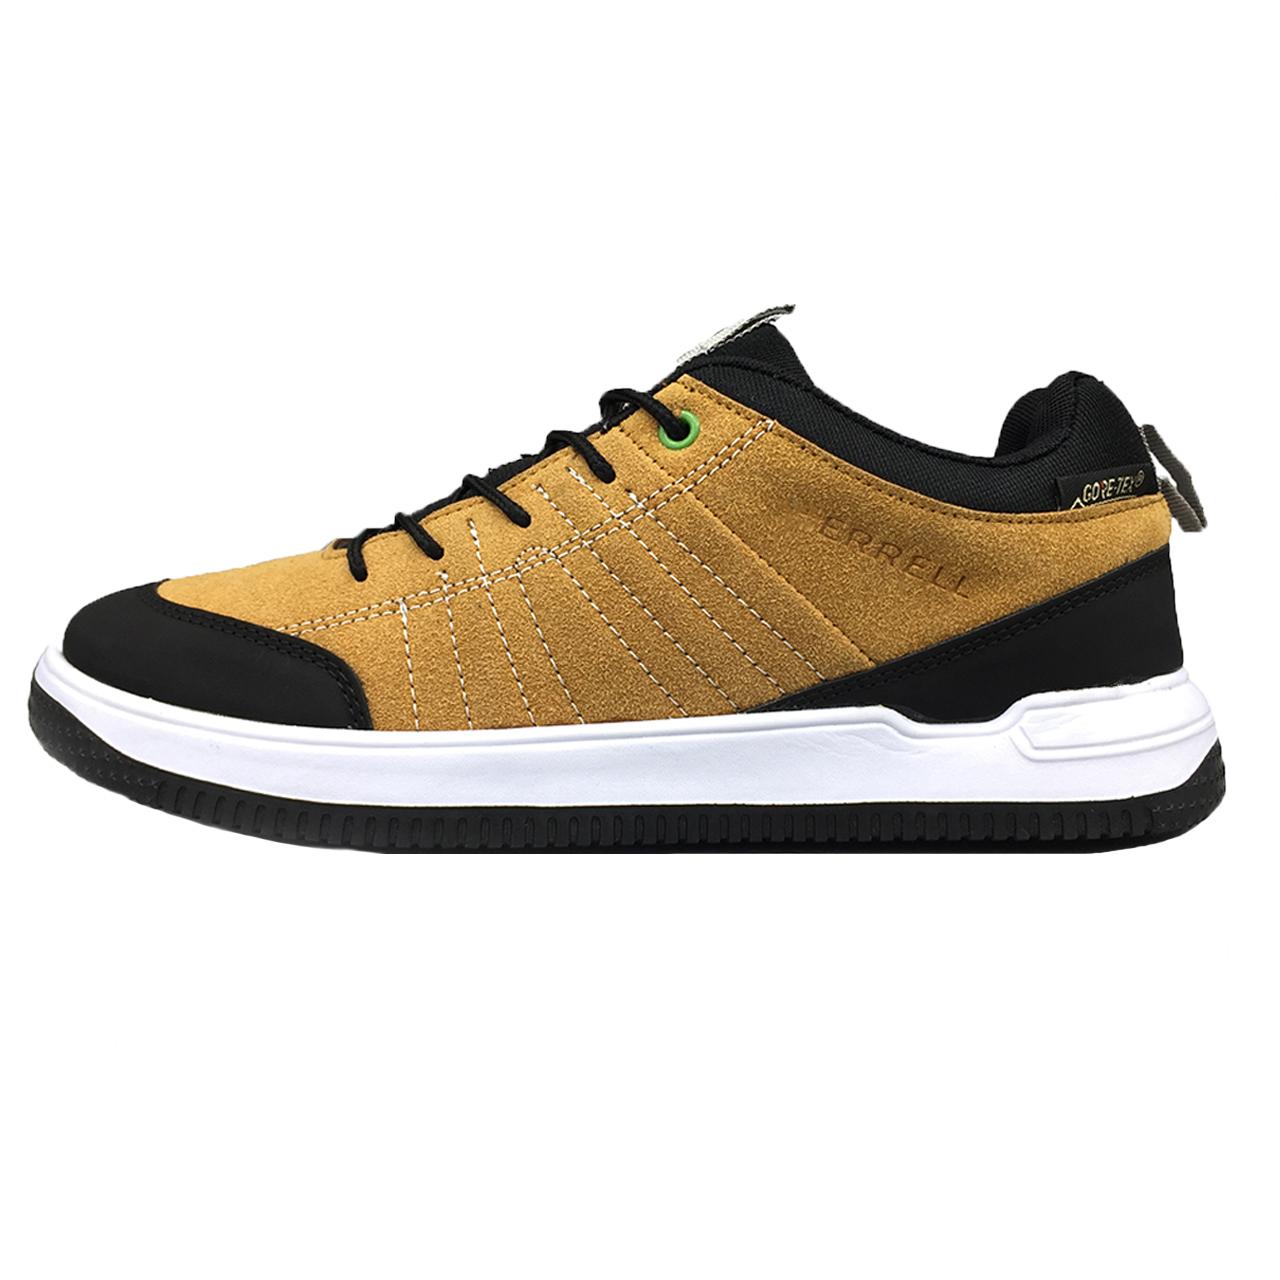 خرید                      کفش اسپورت مدل GORE-TEX-AS